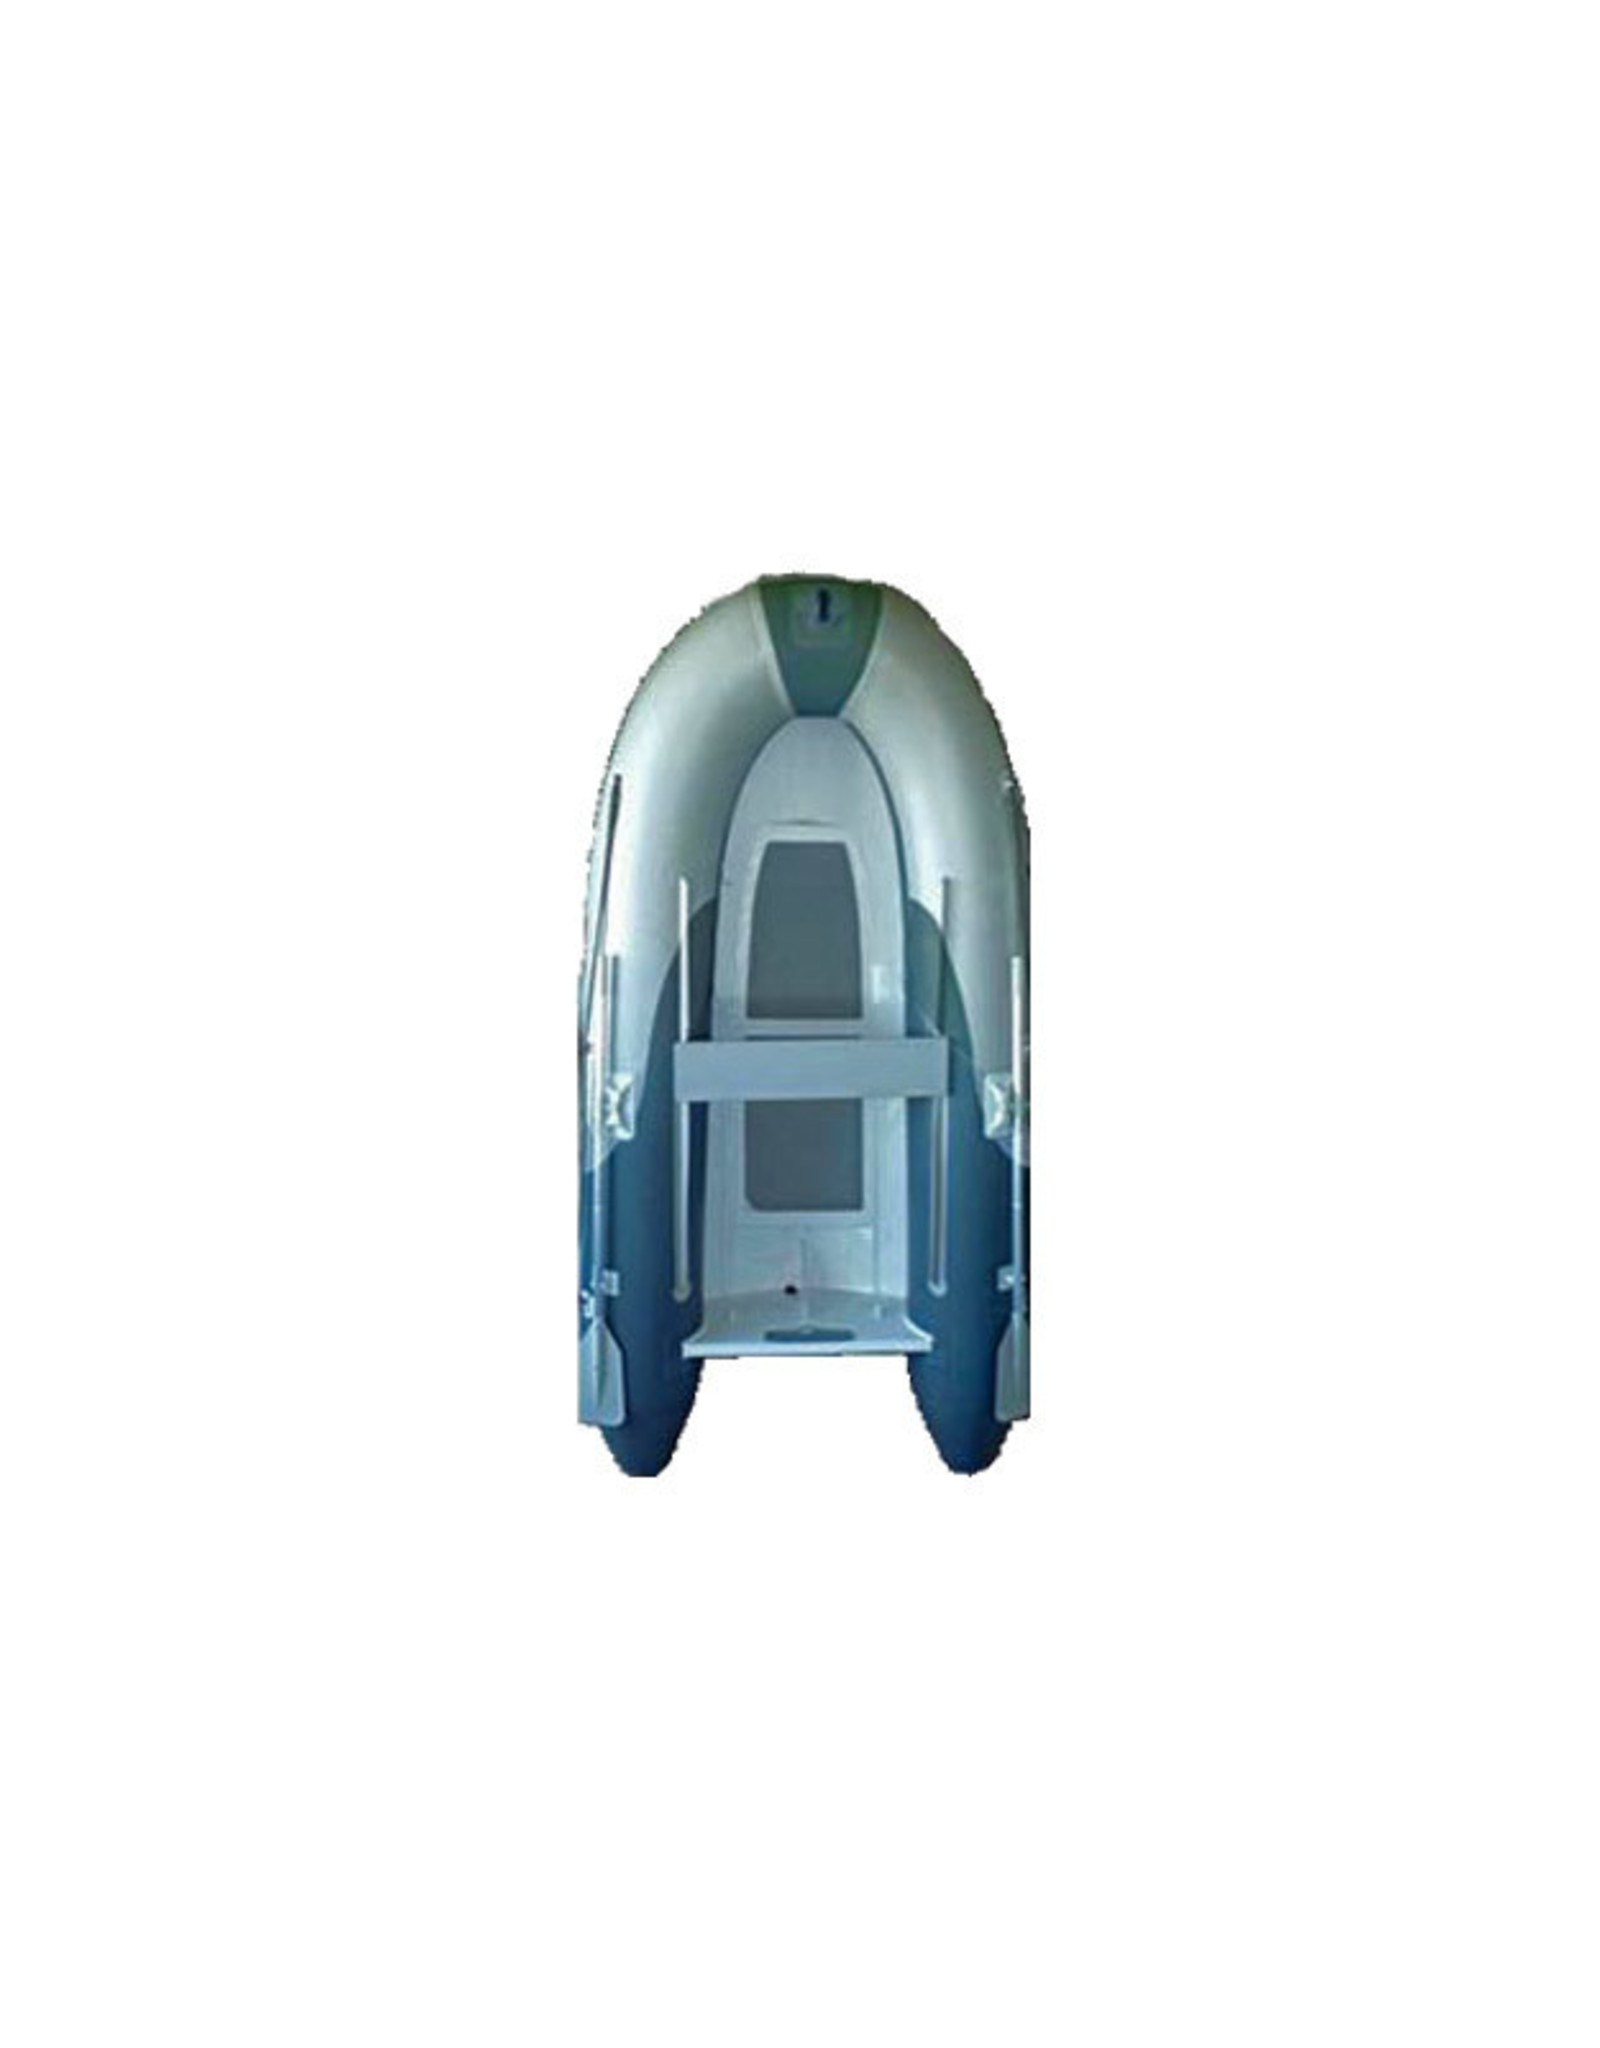 Aluminum Hull Single Floor dinghy